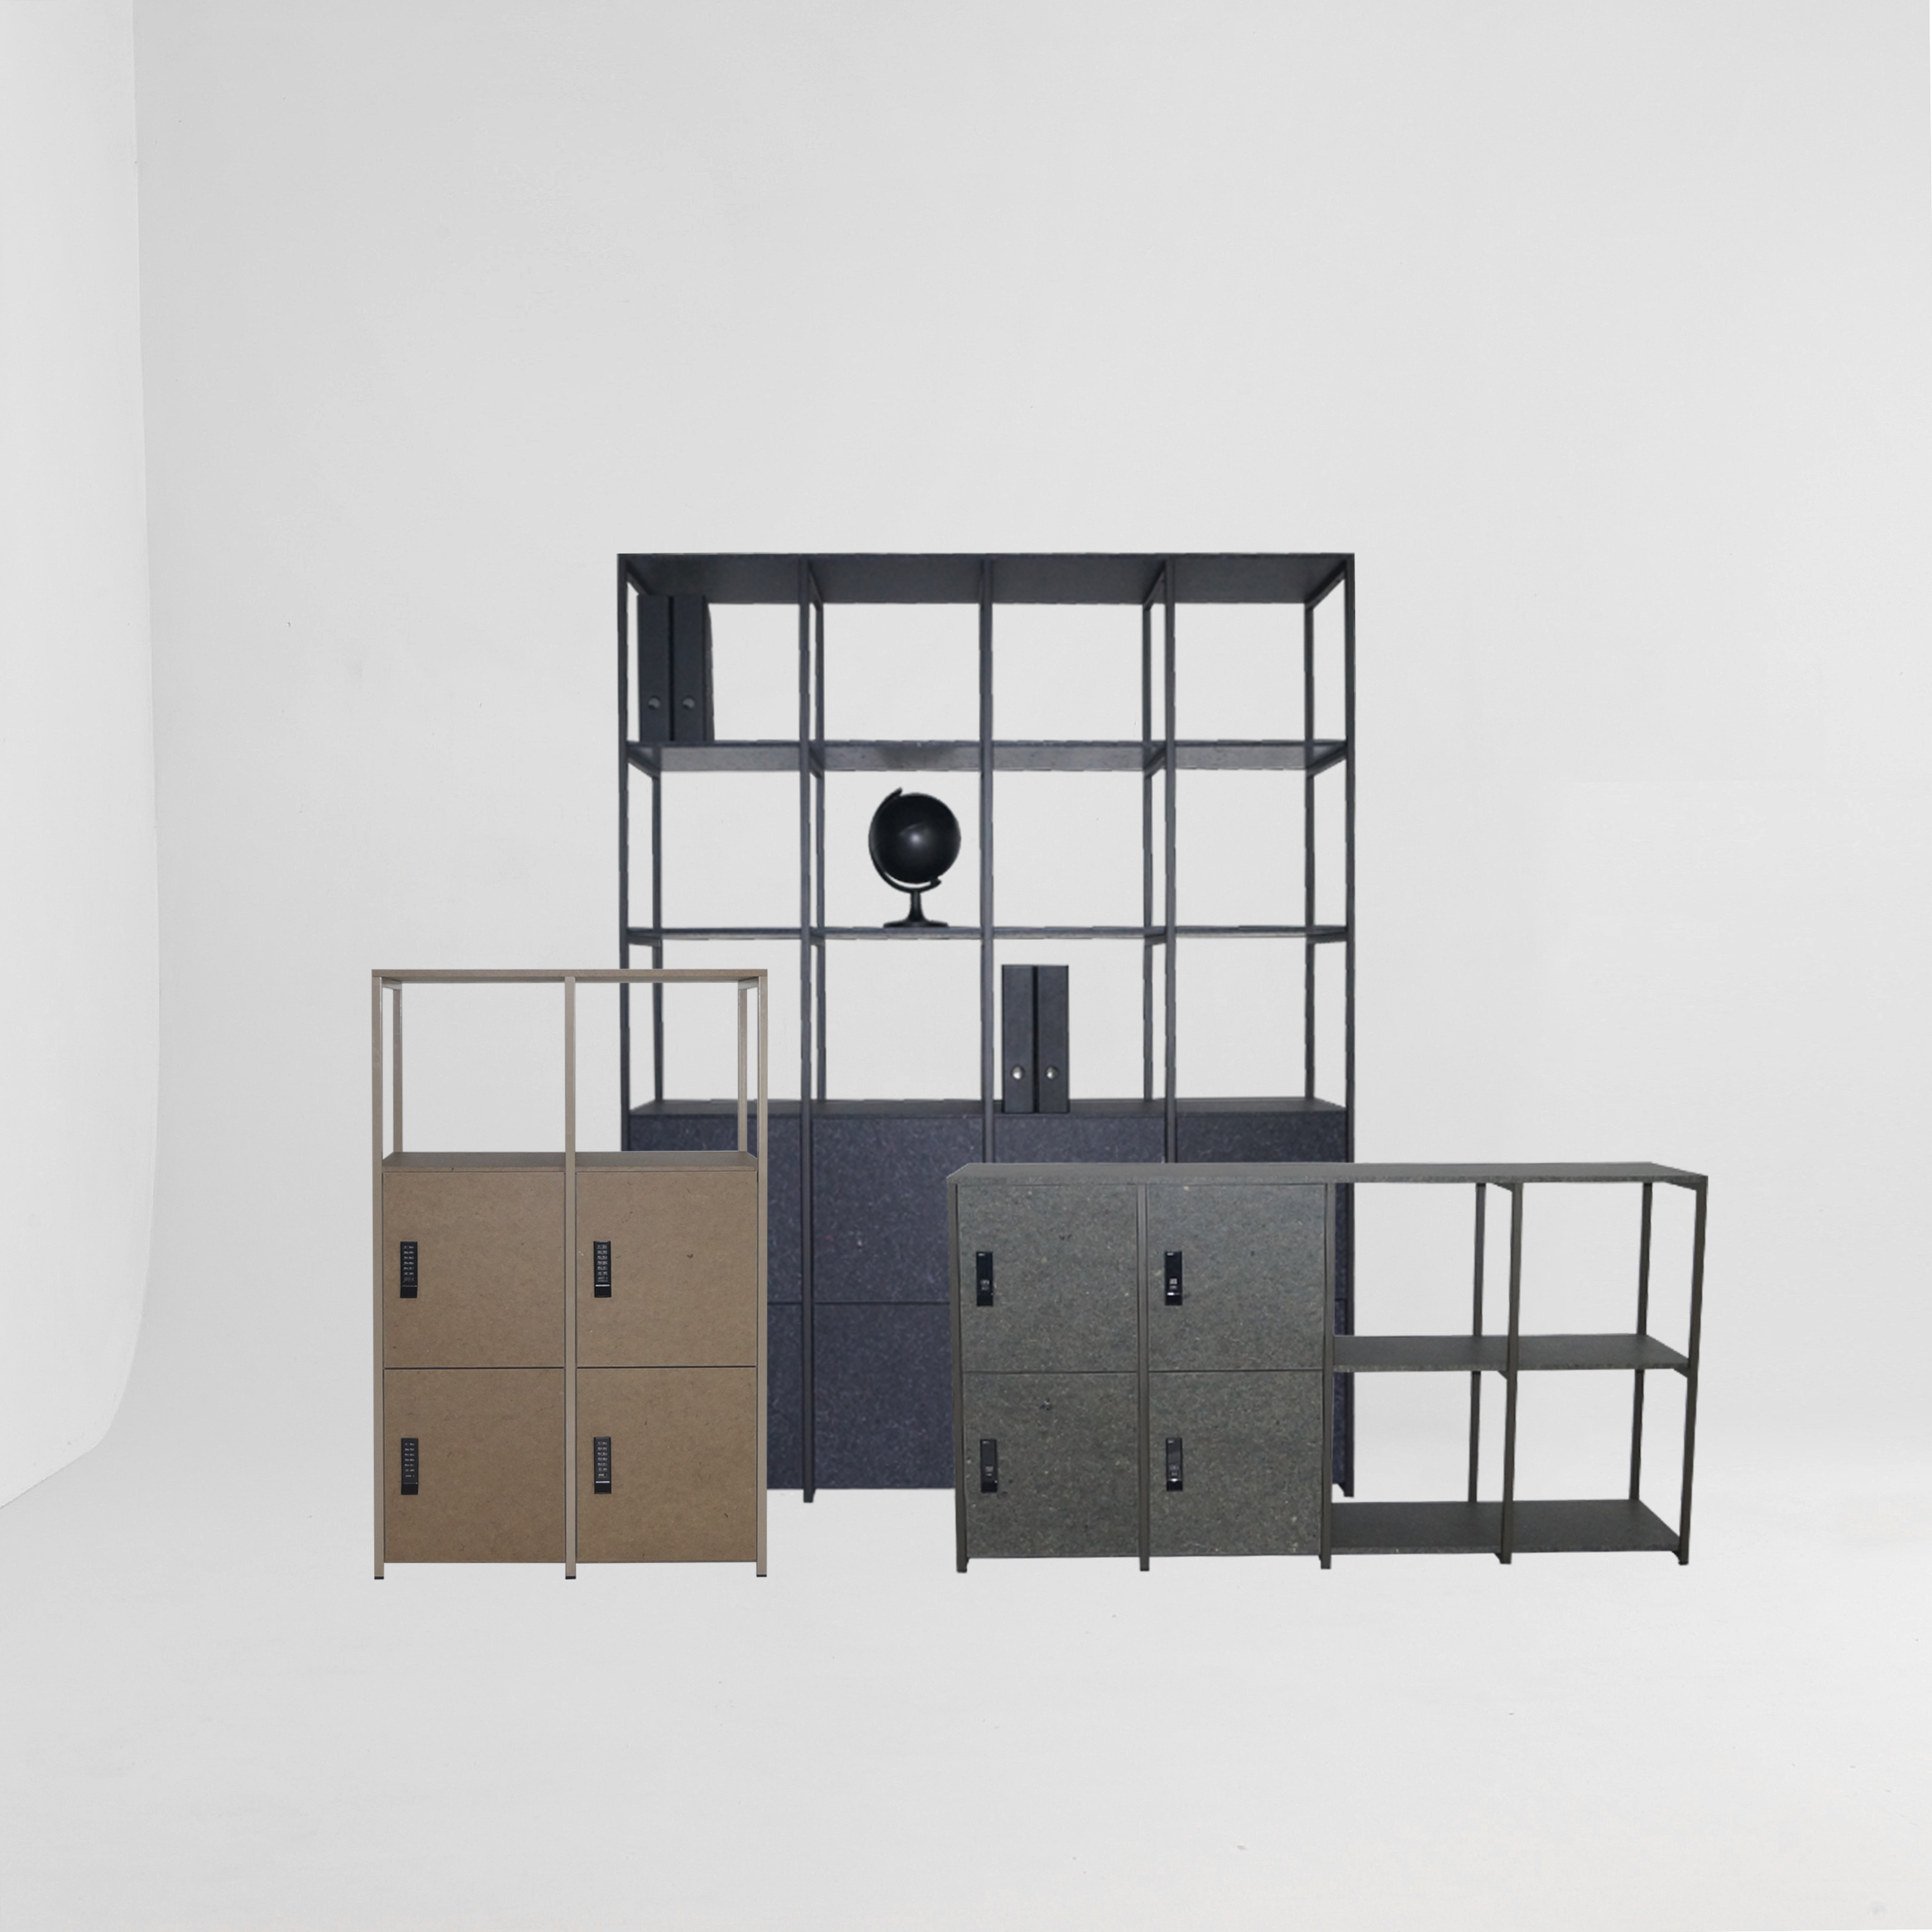 modulaire kasten open kast duurzaam REVV.jpg